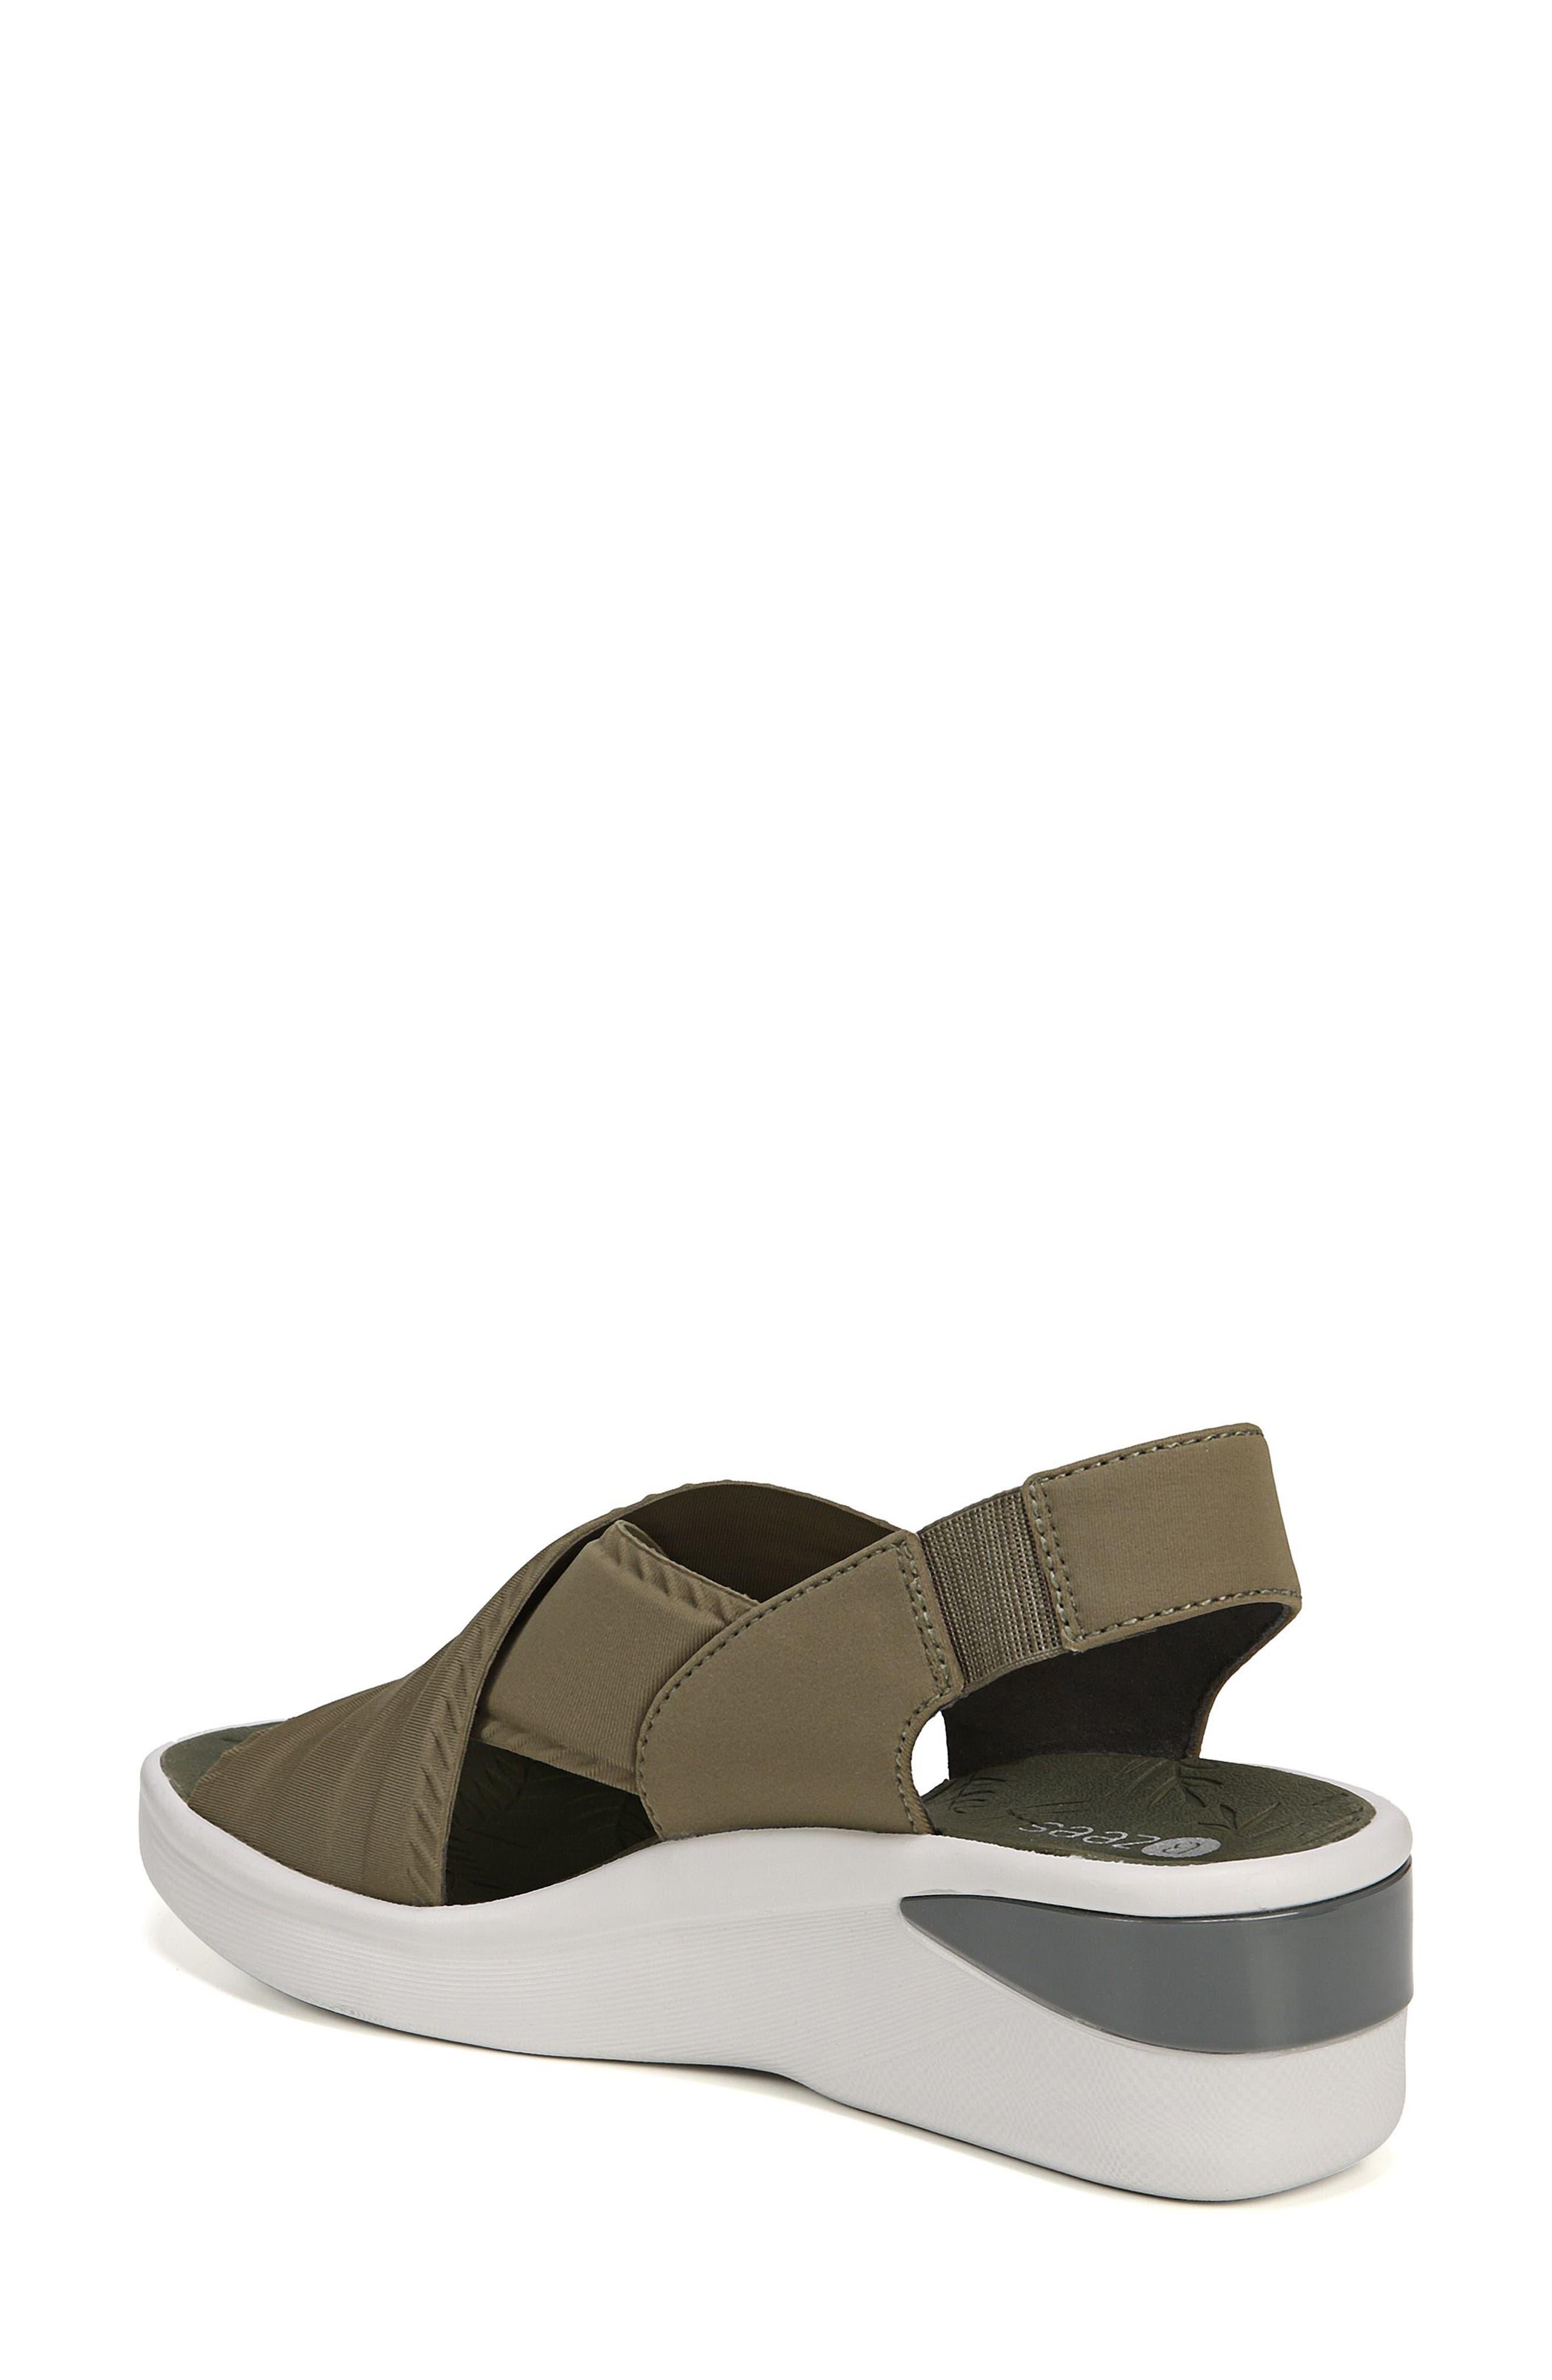 Sunset Wedge Sandal,                             Alternate thumbnail 2, color,                             Olive Fabric